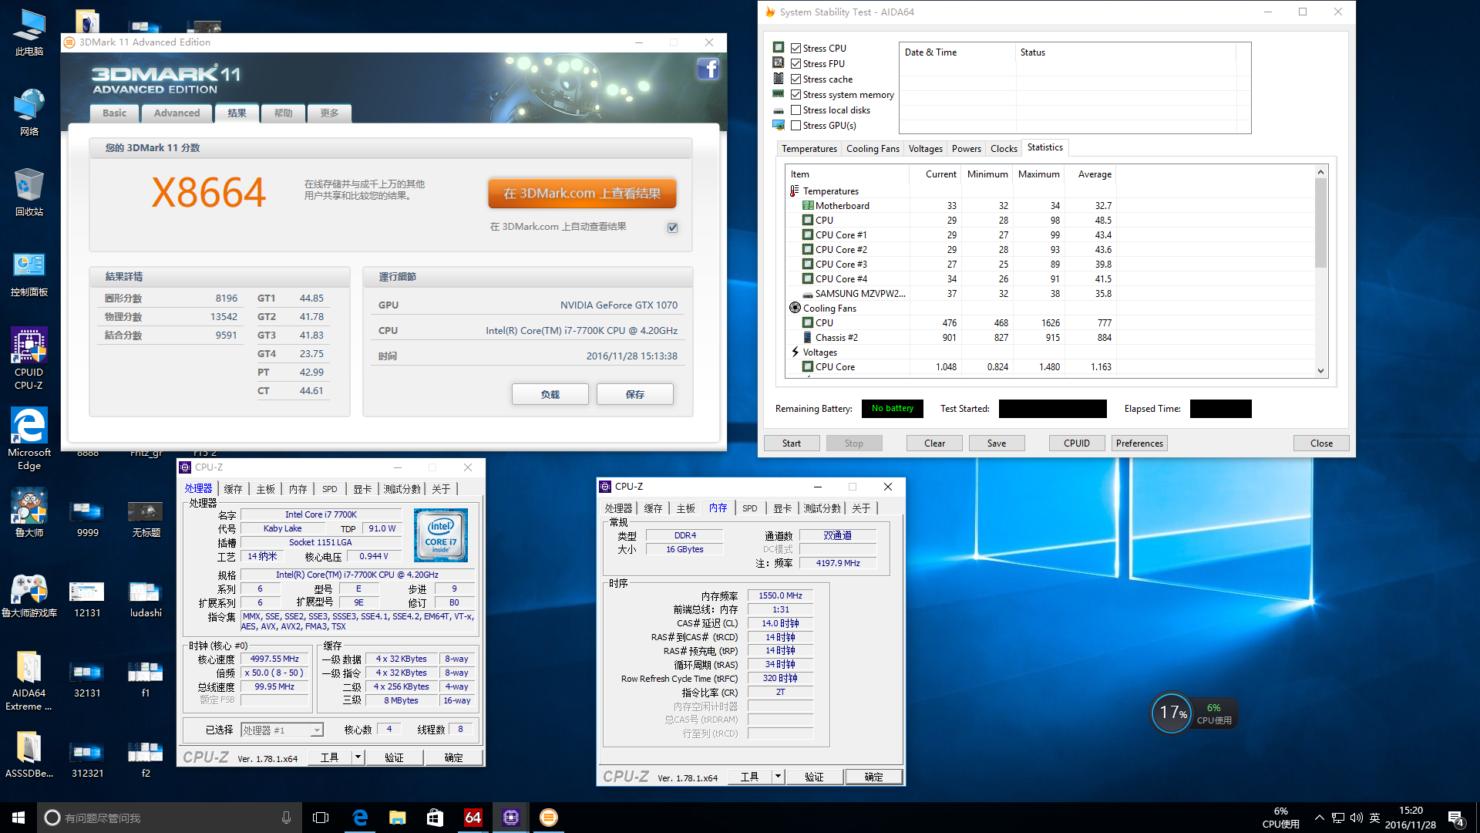 intel-core-i7-7700k-kaby-lake-benchmarks_oc_3dmark-11-5-ghz